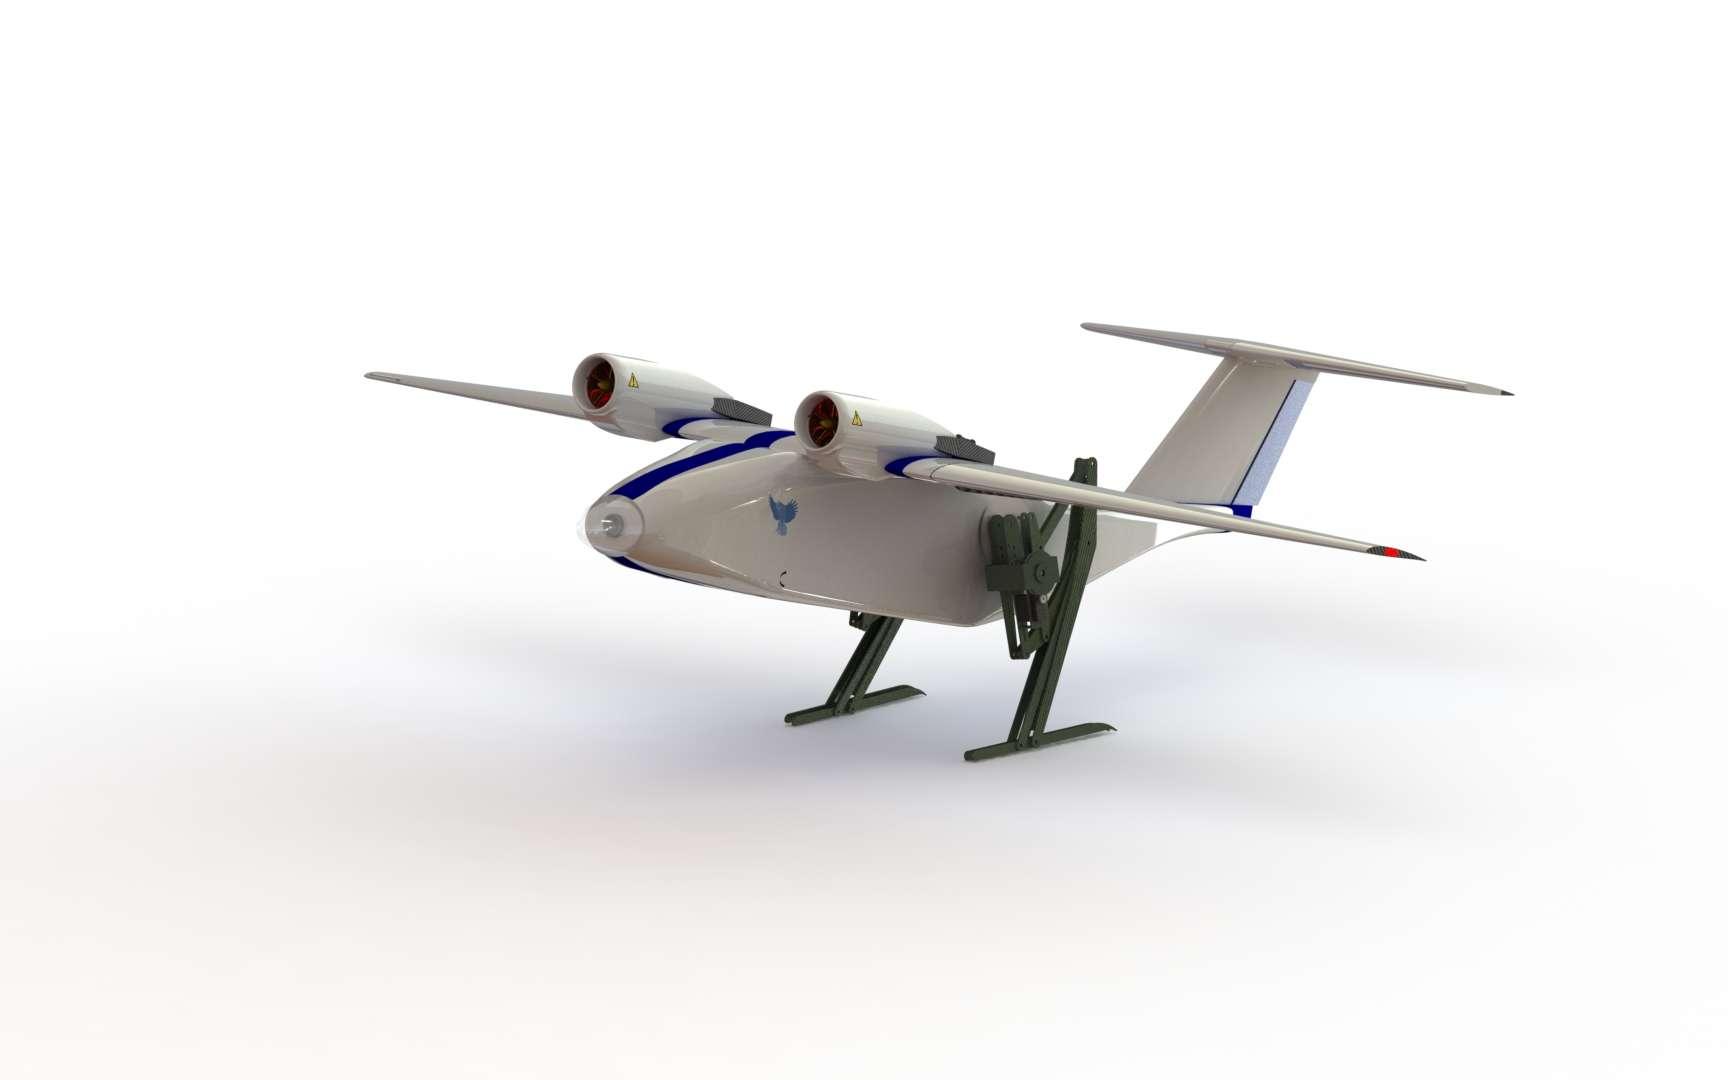 Le drone Sparrow de Passerine Aircraft. © Passerine Aircraft Corp.